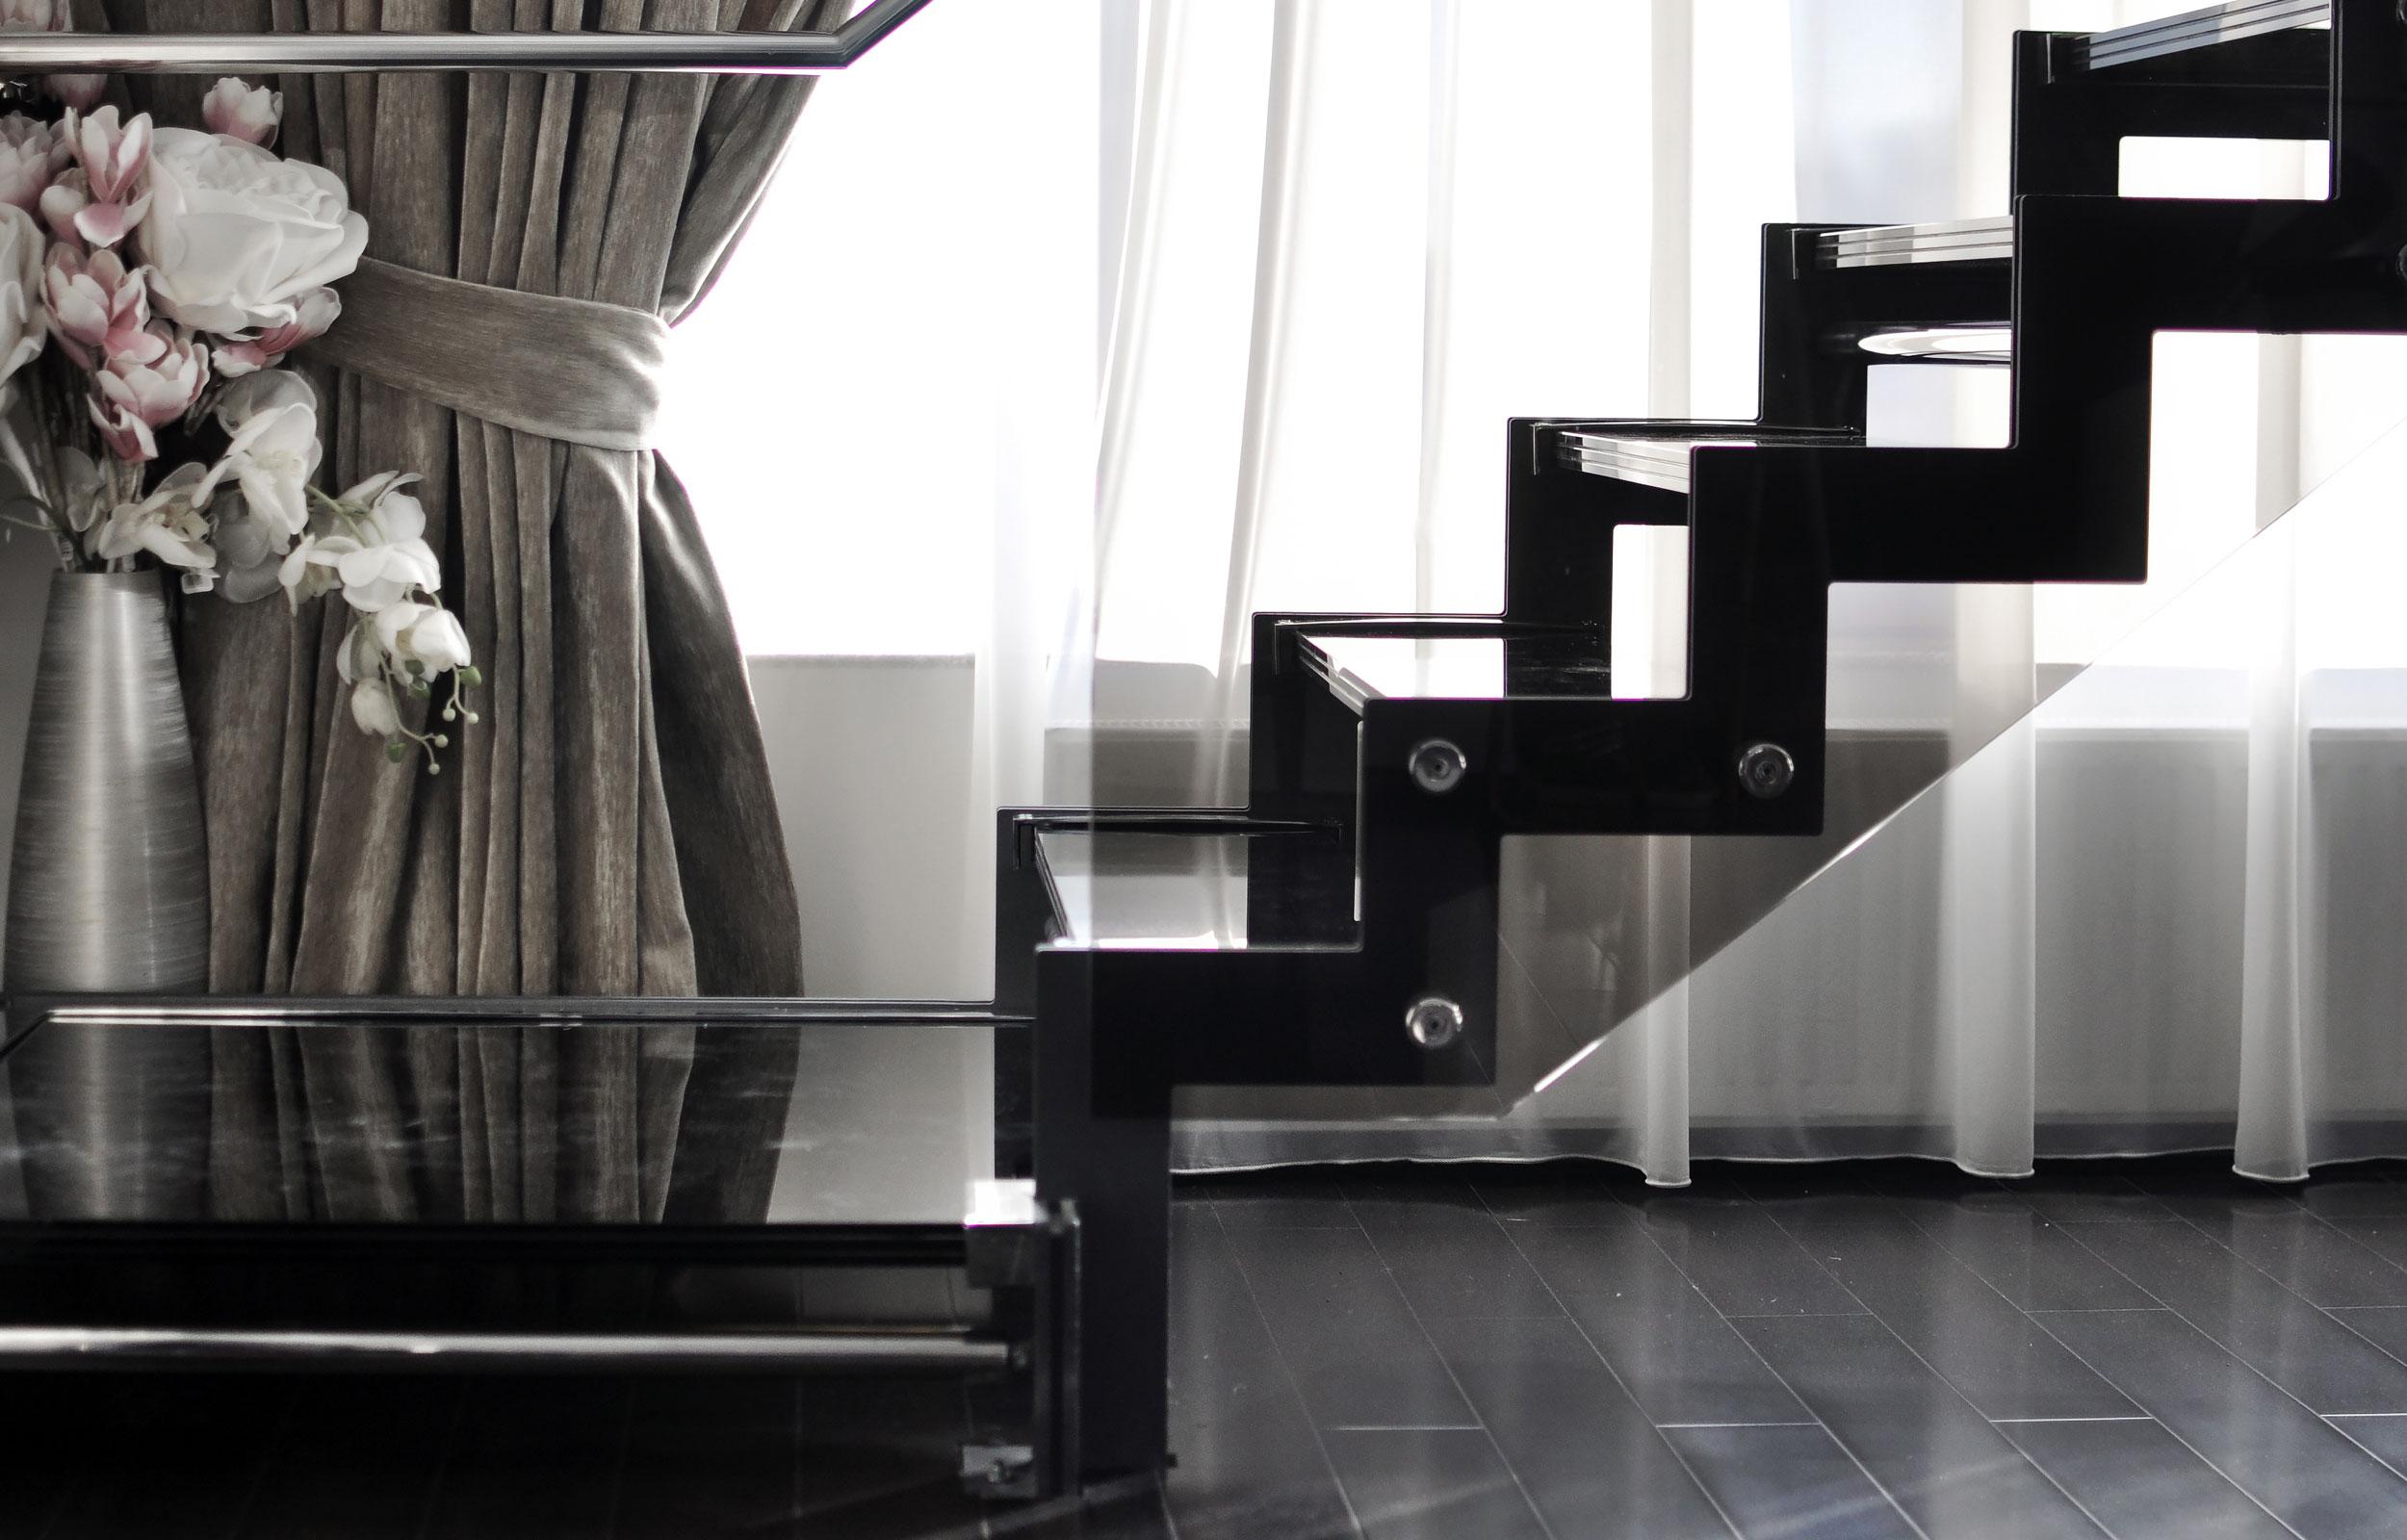 Scara interioara trepte sticla bronz negru balustrada inox haute couture metal Aleen